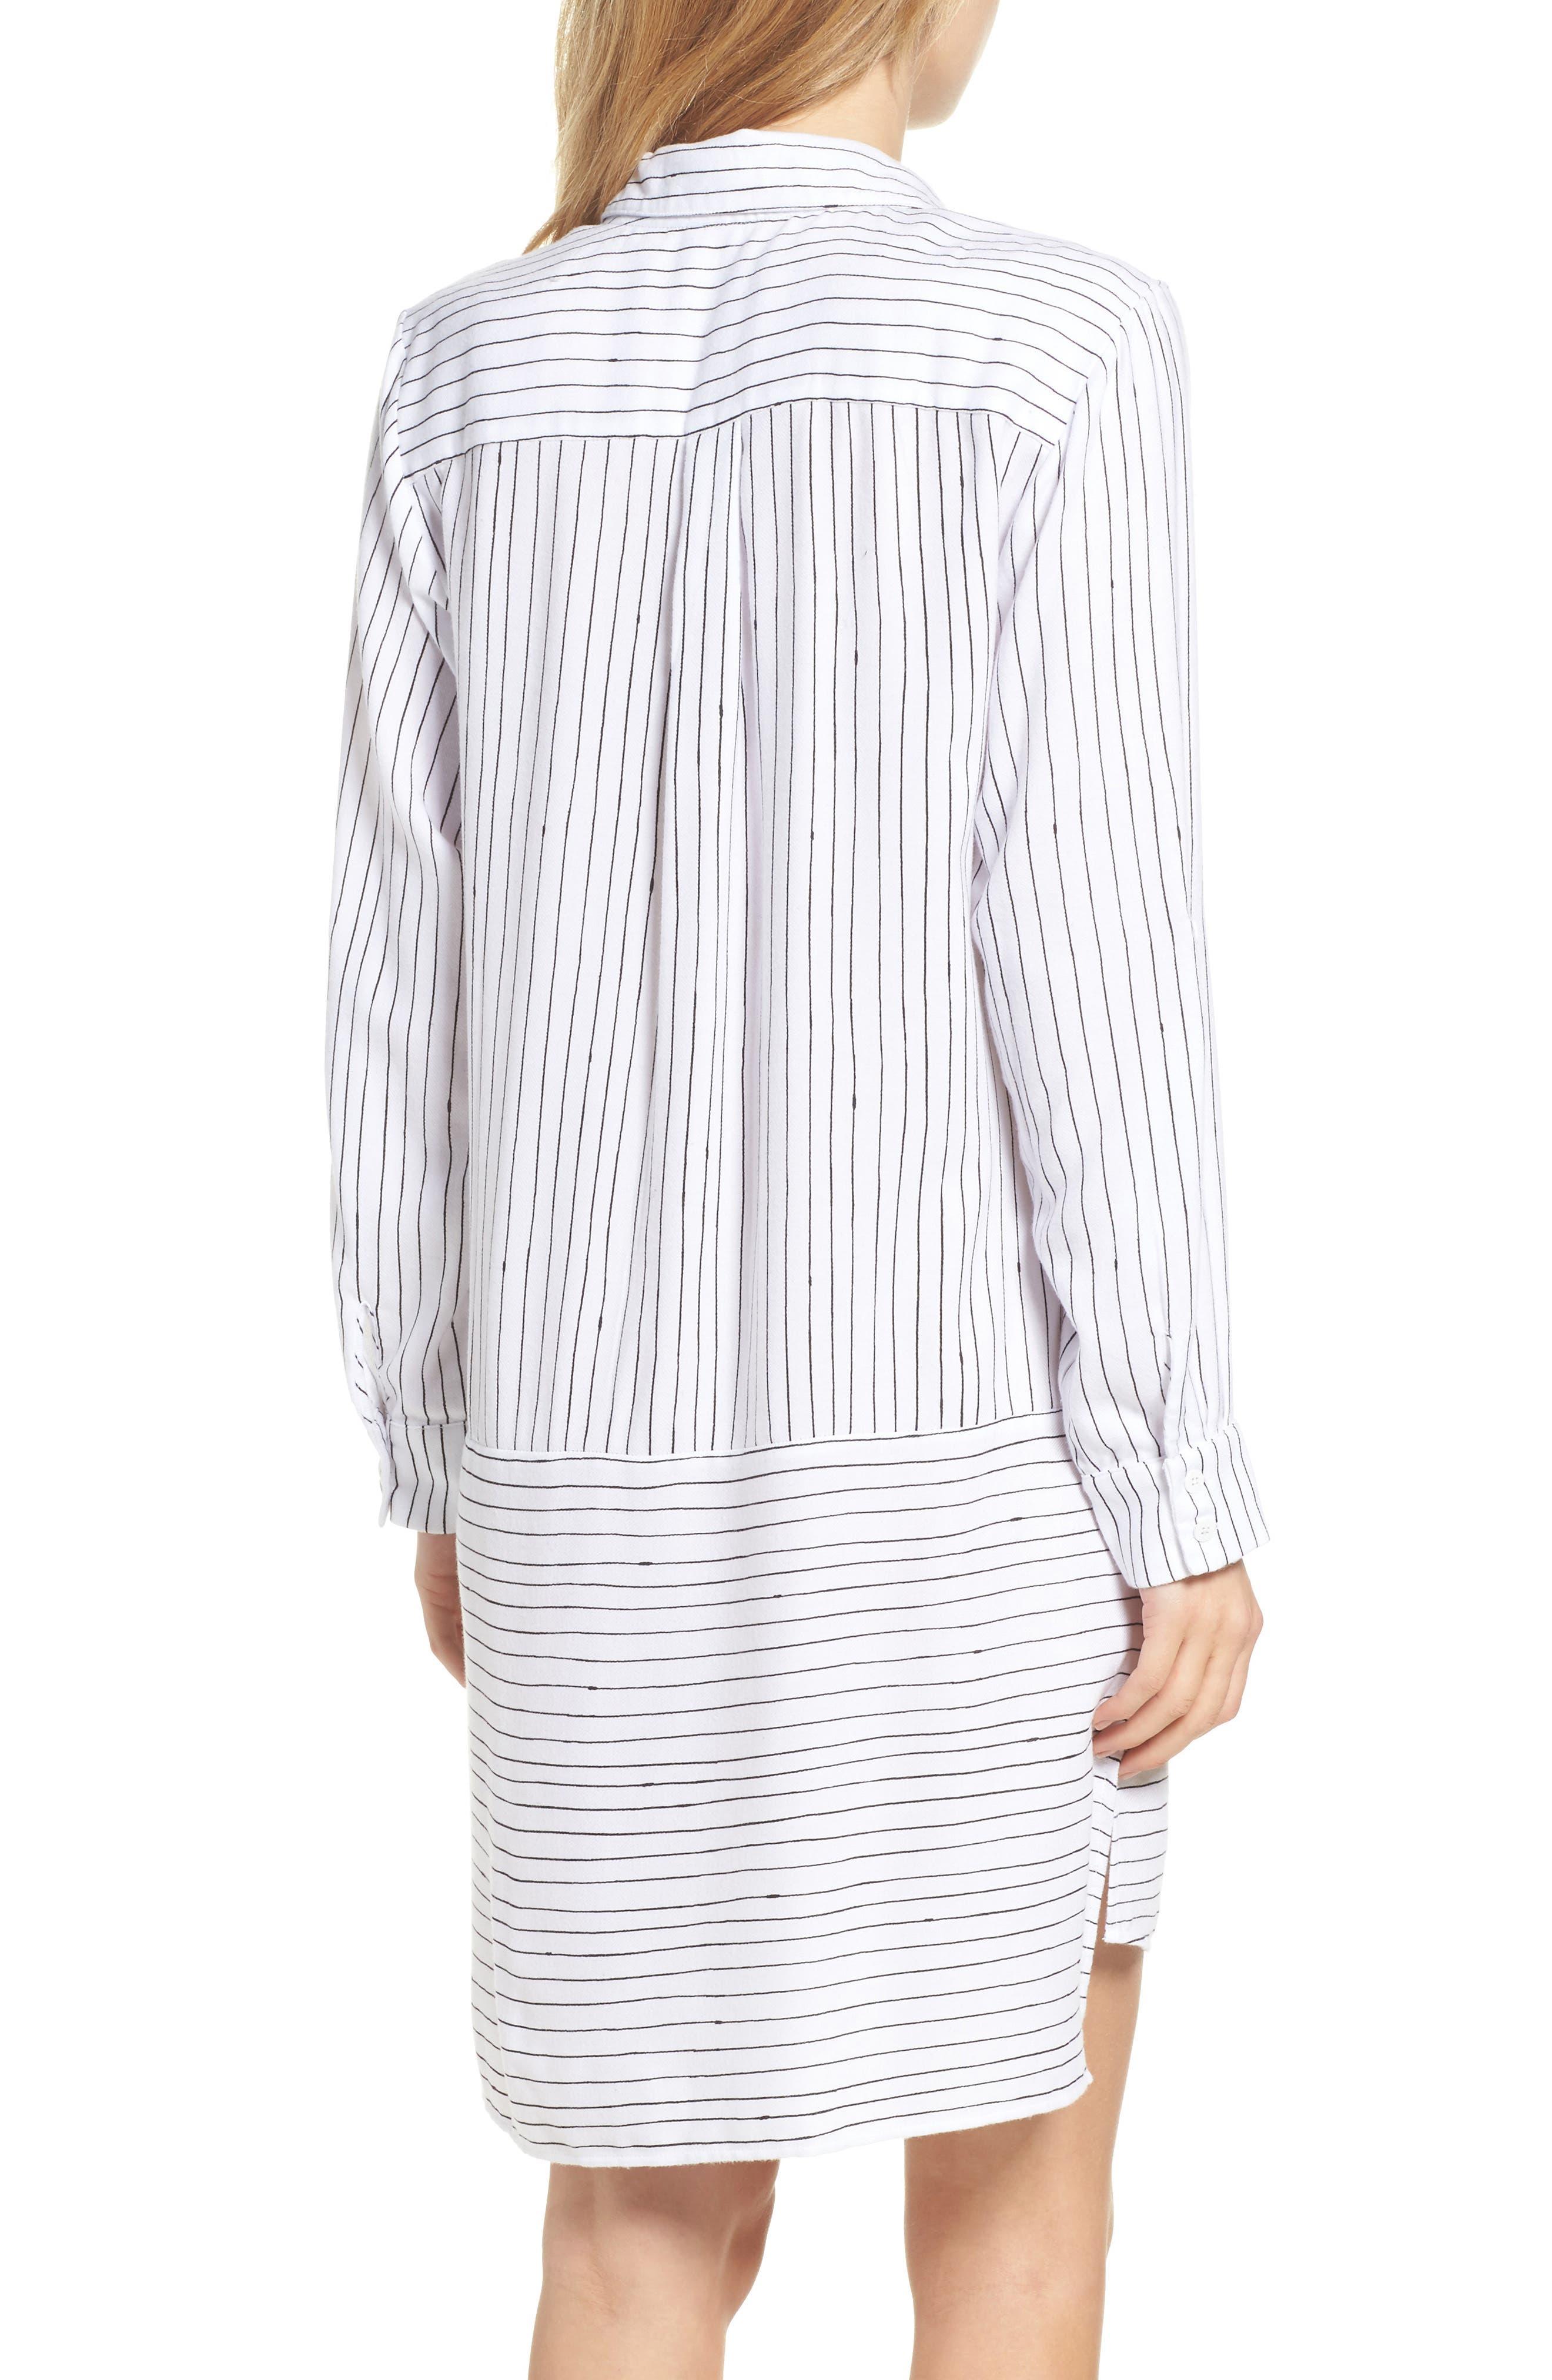 Stripe Sleep Shirt,                             Alternate thumbnail 2, color,                             White Stripe Print